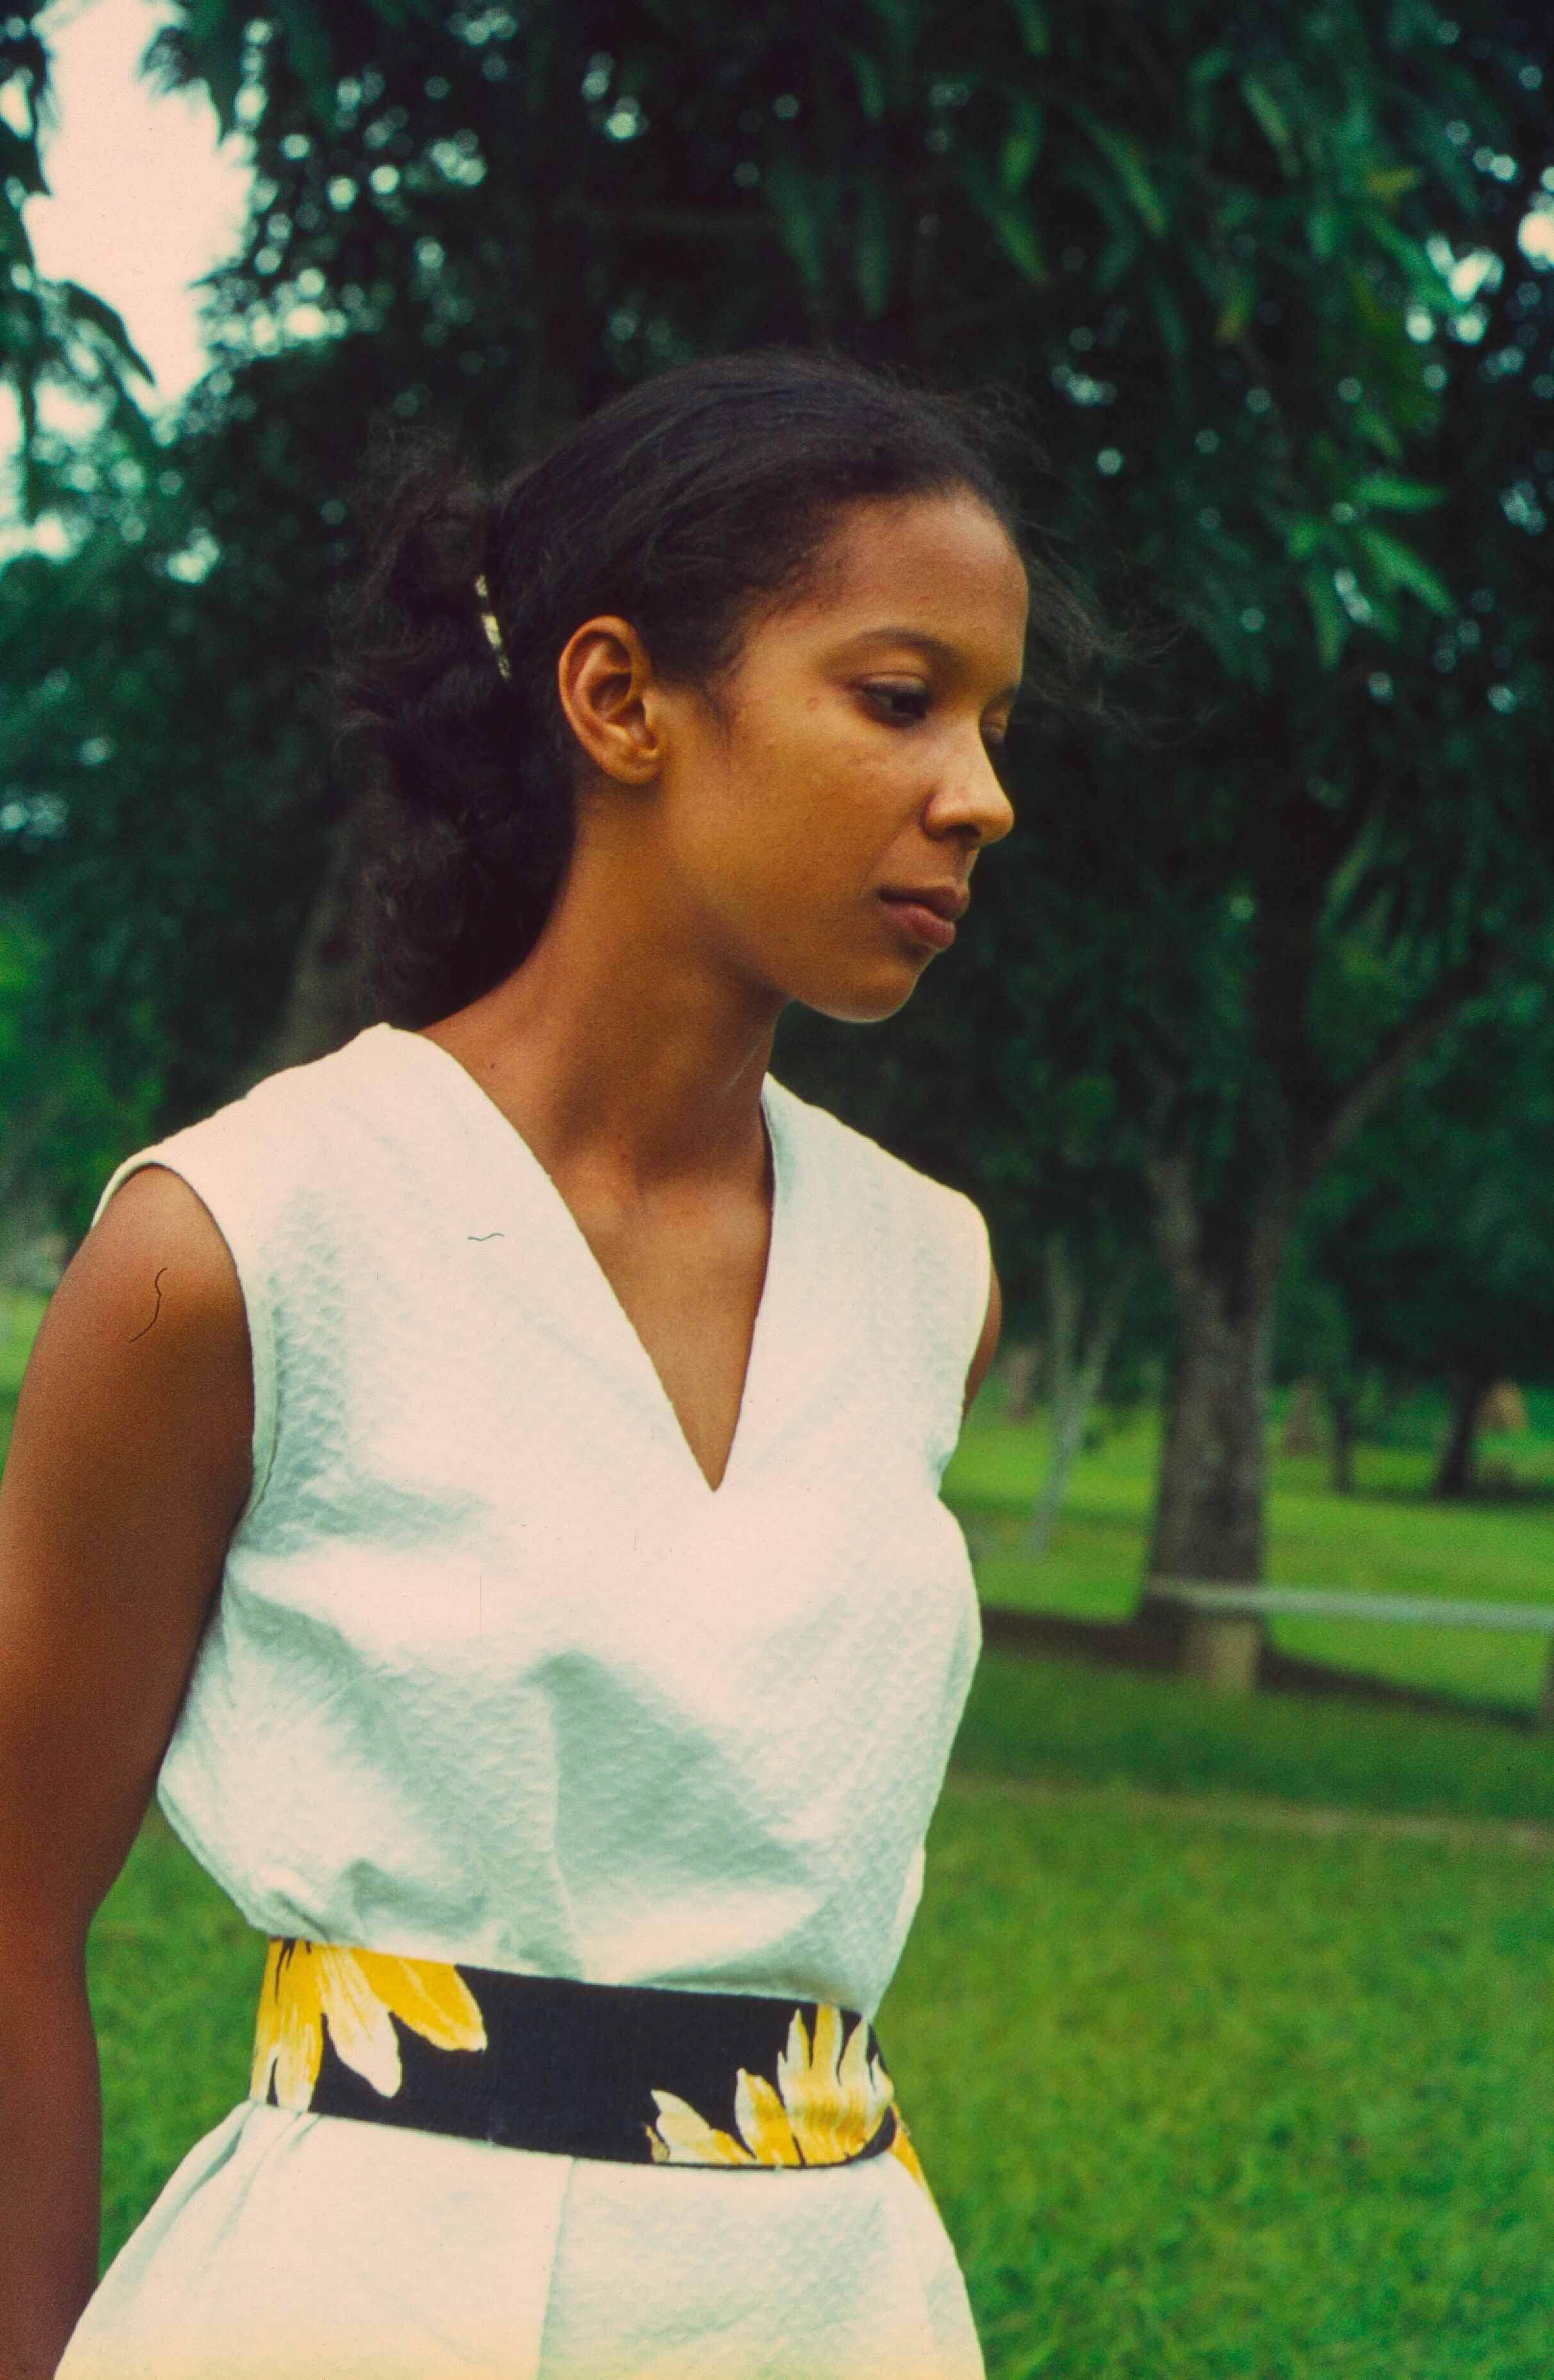 184. Suriname